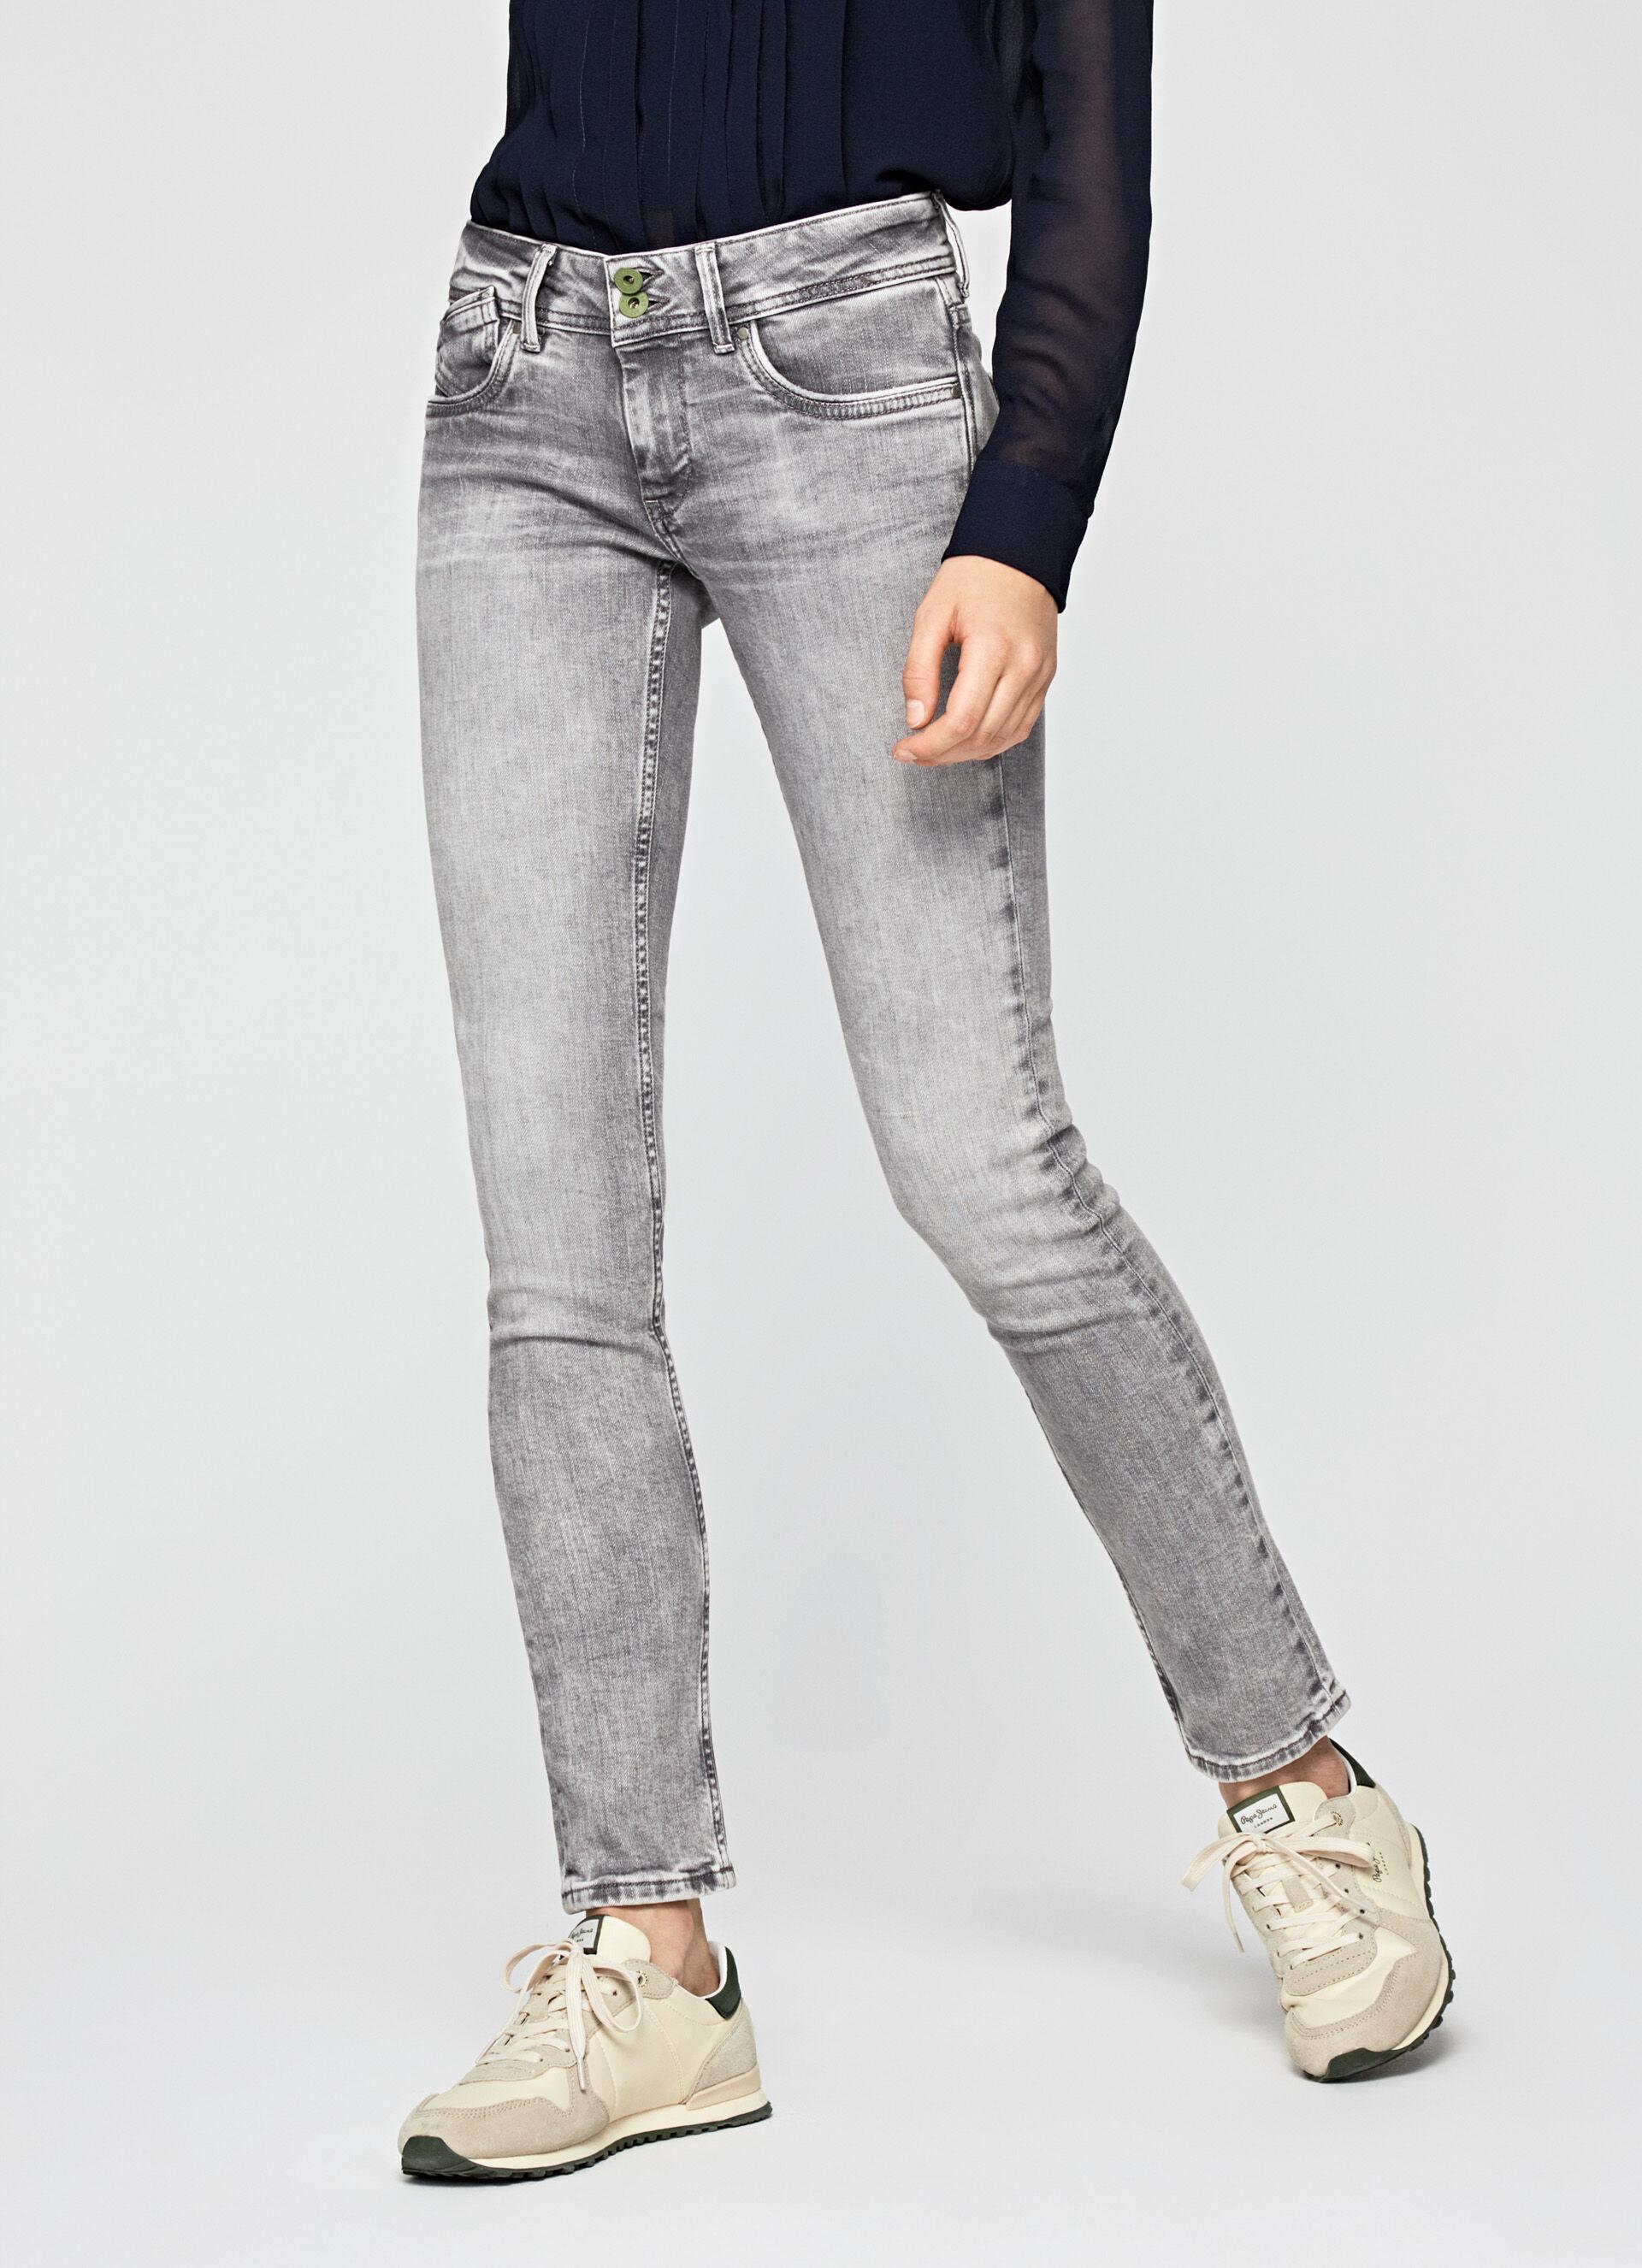 Ropa MujerPepe De Jeans Novedades London En nOX0PZNk8w